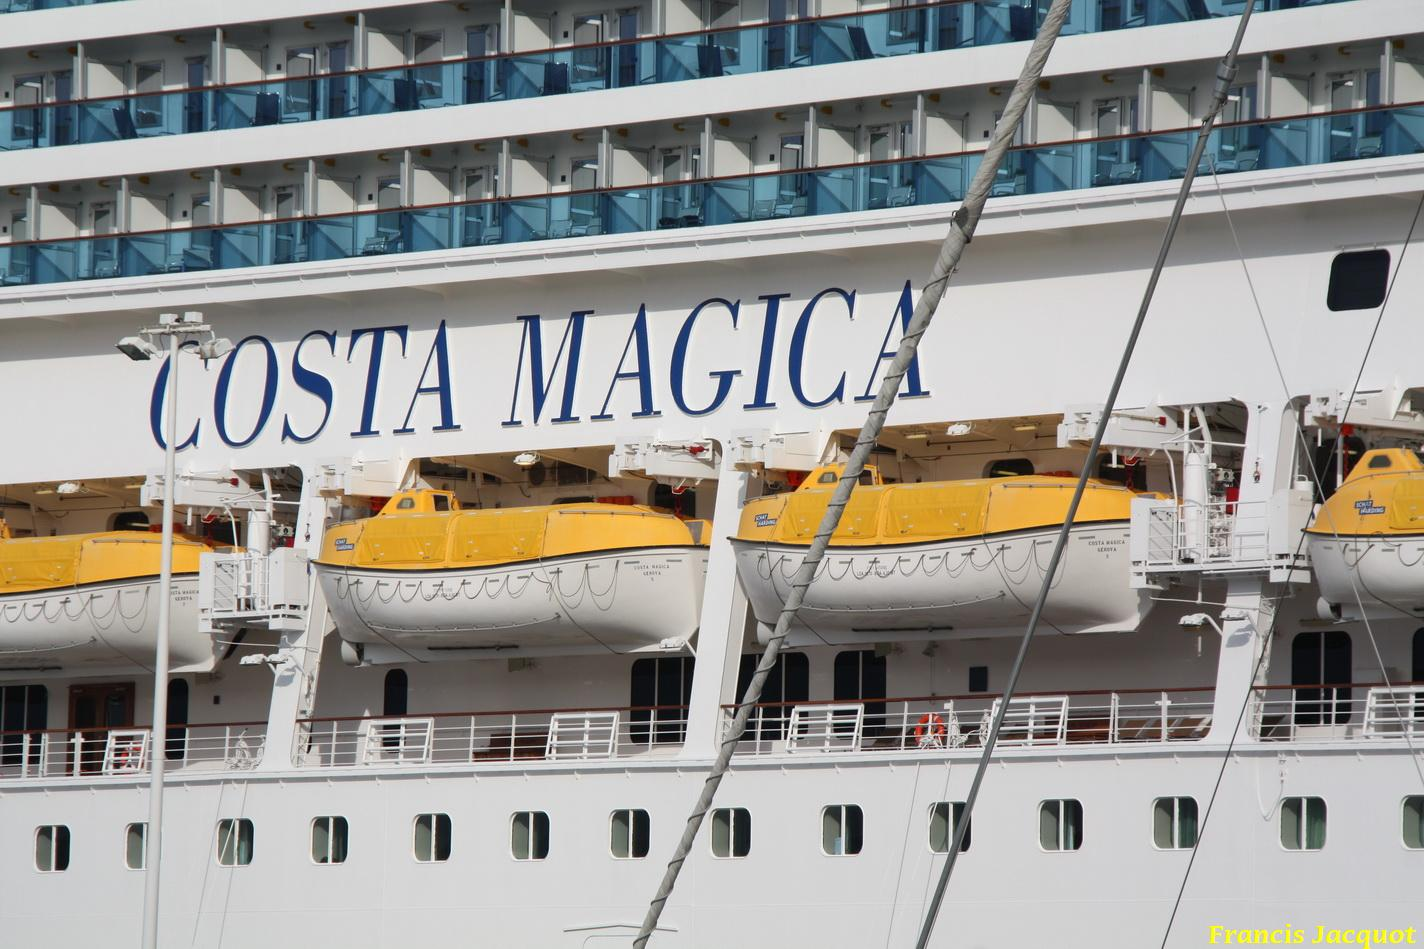 Le Costa Magica en escale à La Seyne sur Mer 0910